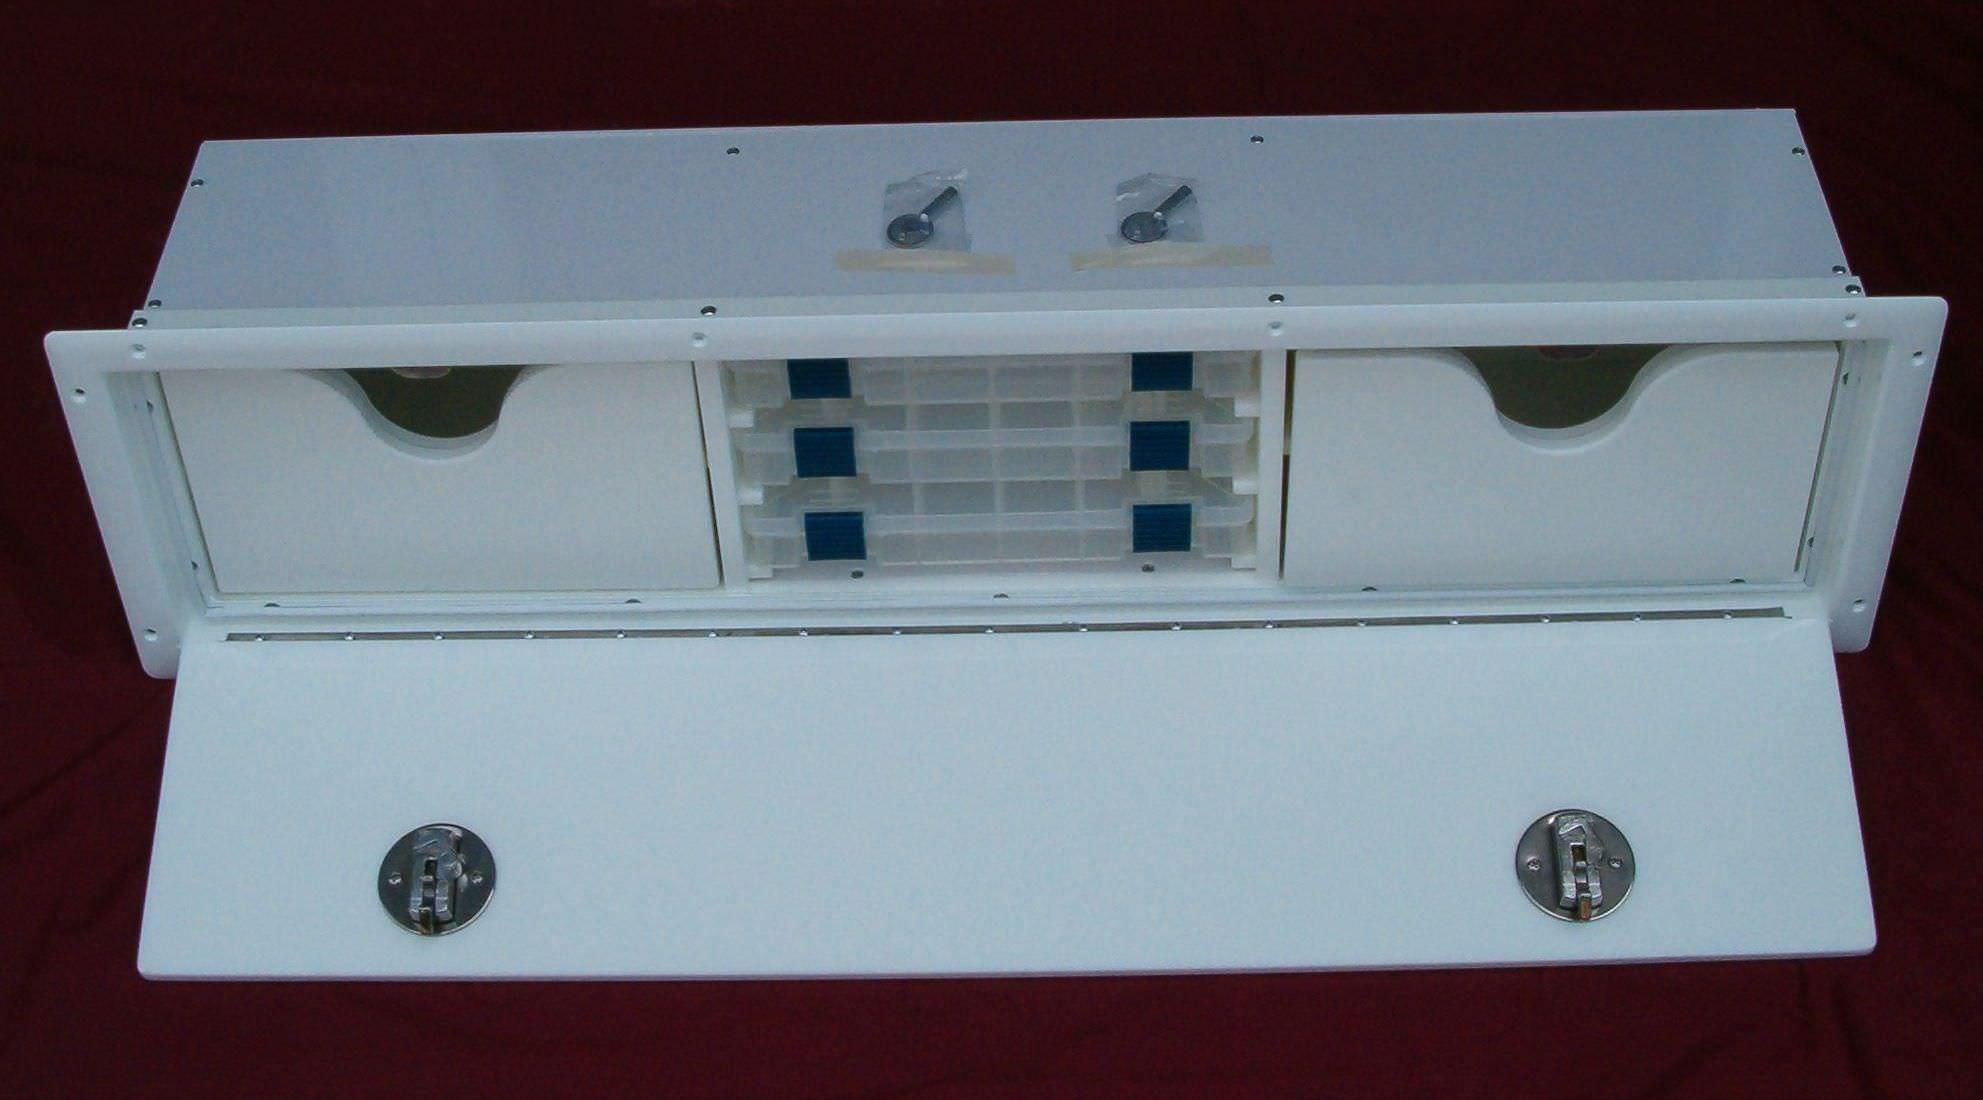 Merveilleux Boat Storage Box. Driver Seat Tackle Center Metal Moulding